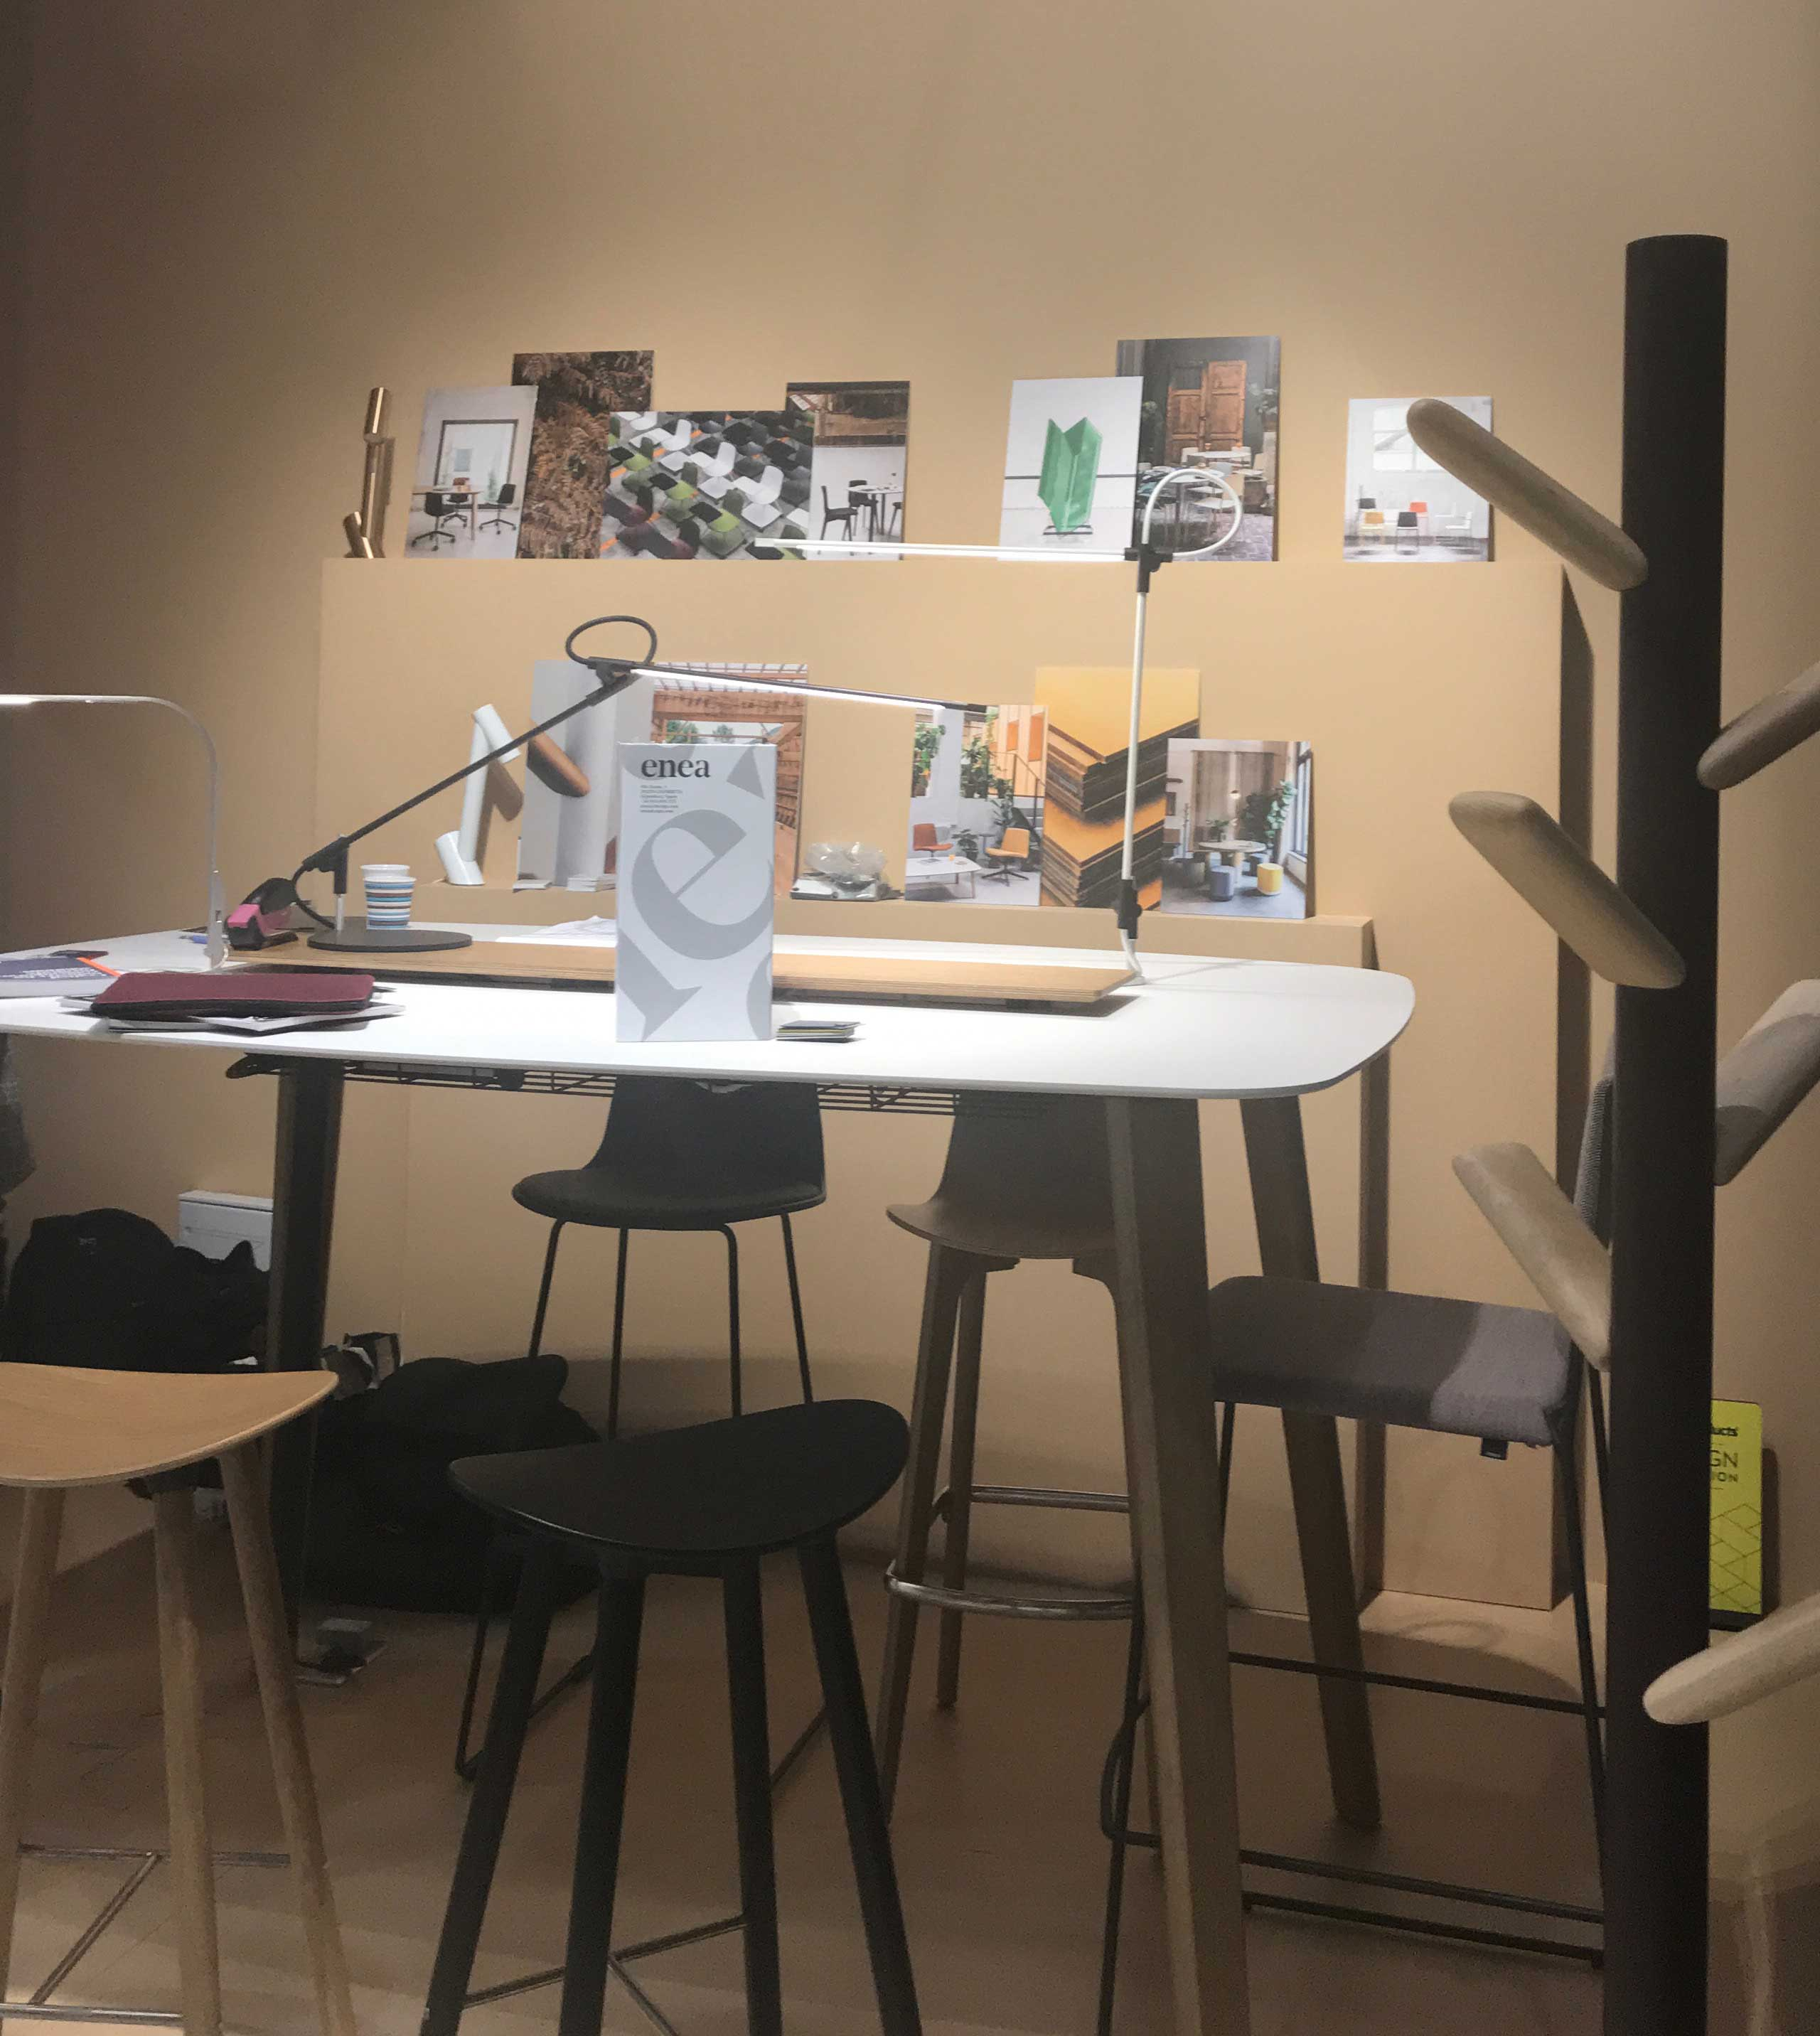 IMGEnea-workspaceinspiration-masioetobjet_1317